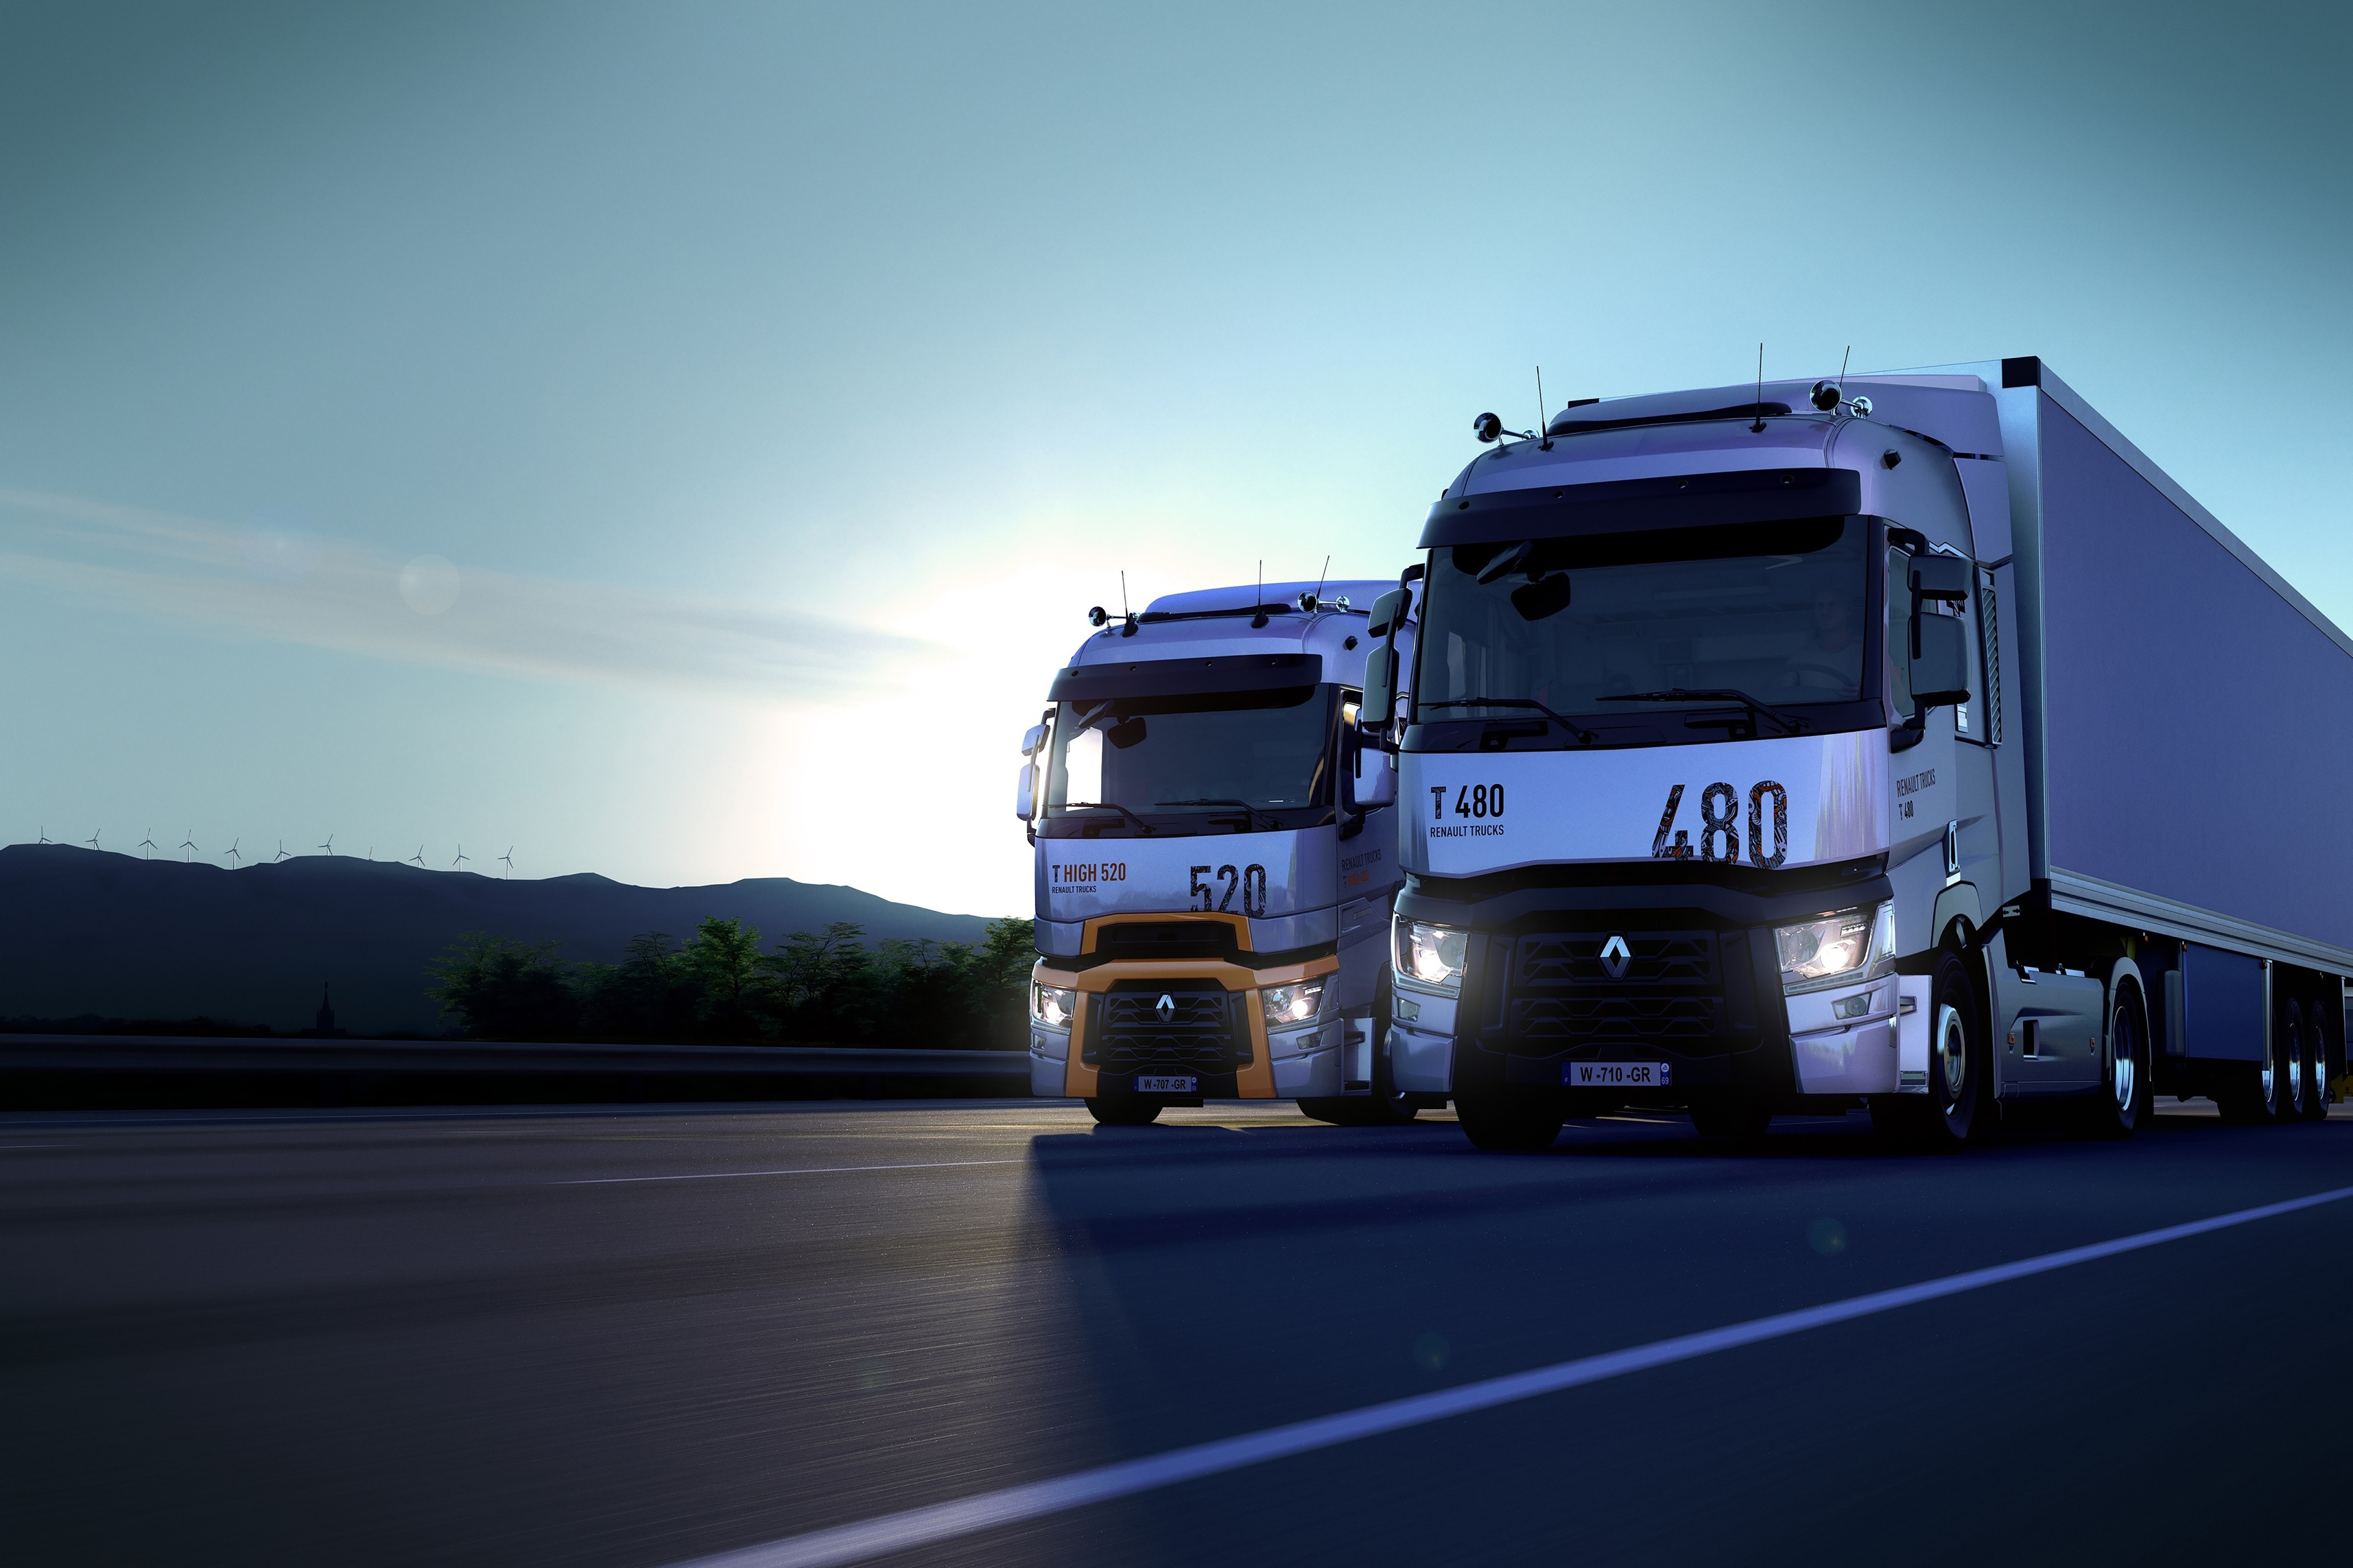 renault-trucks_road-show_gorsel-5.jpg